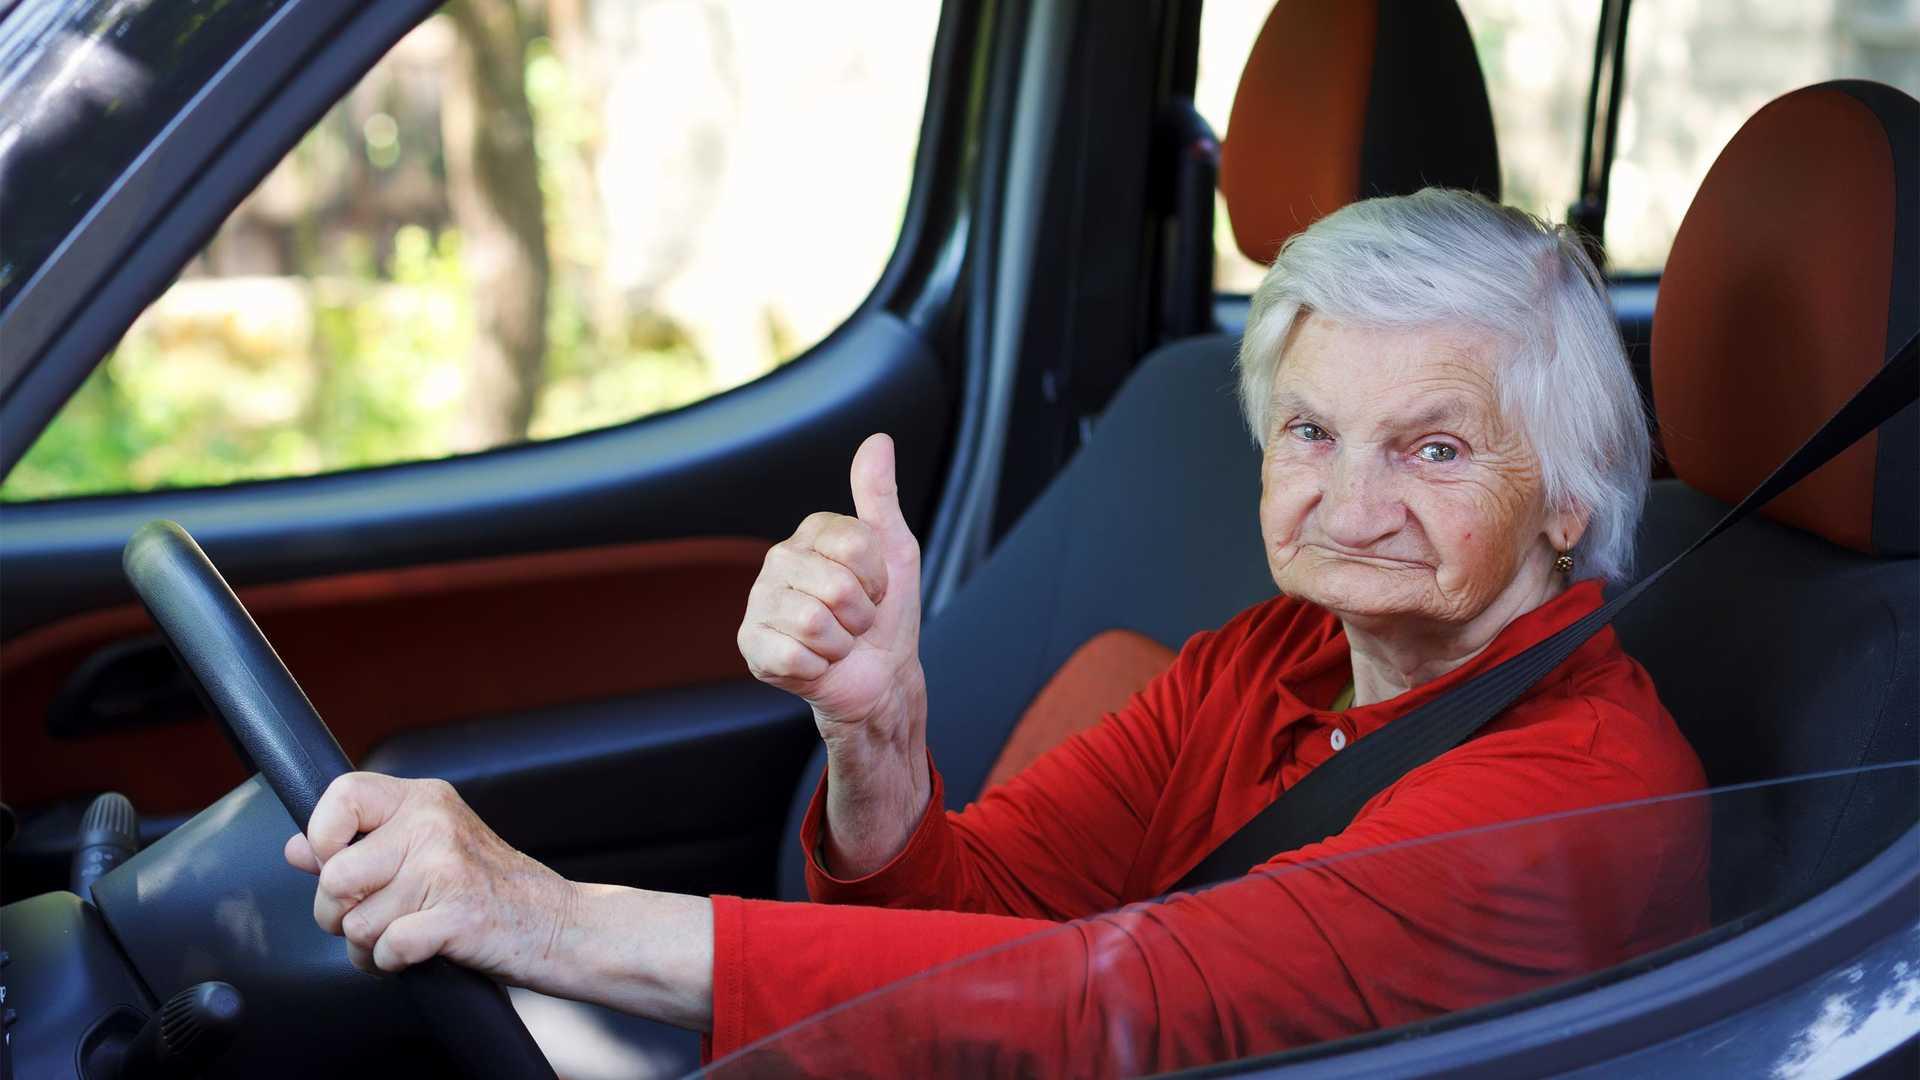 Photo of Σούπερ-γιαγιά 79 ετών πήγαινε με 240 χλμ./ώρα με μία Porsche Boxster GTS